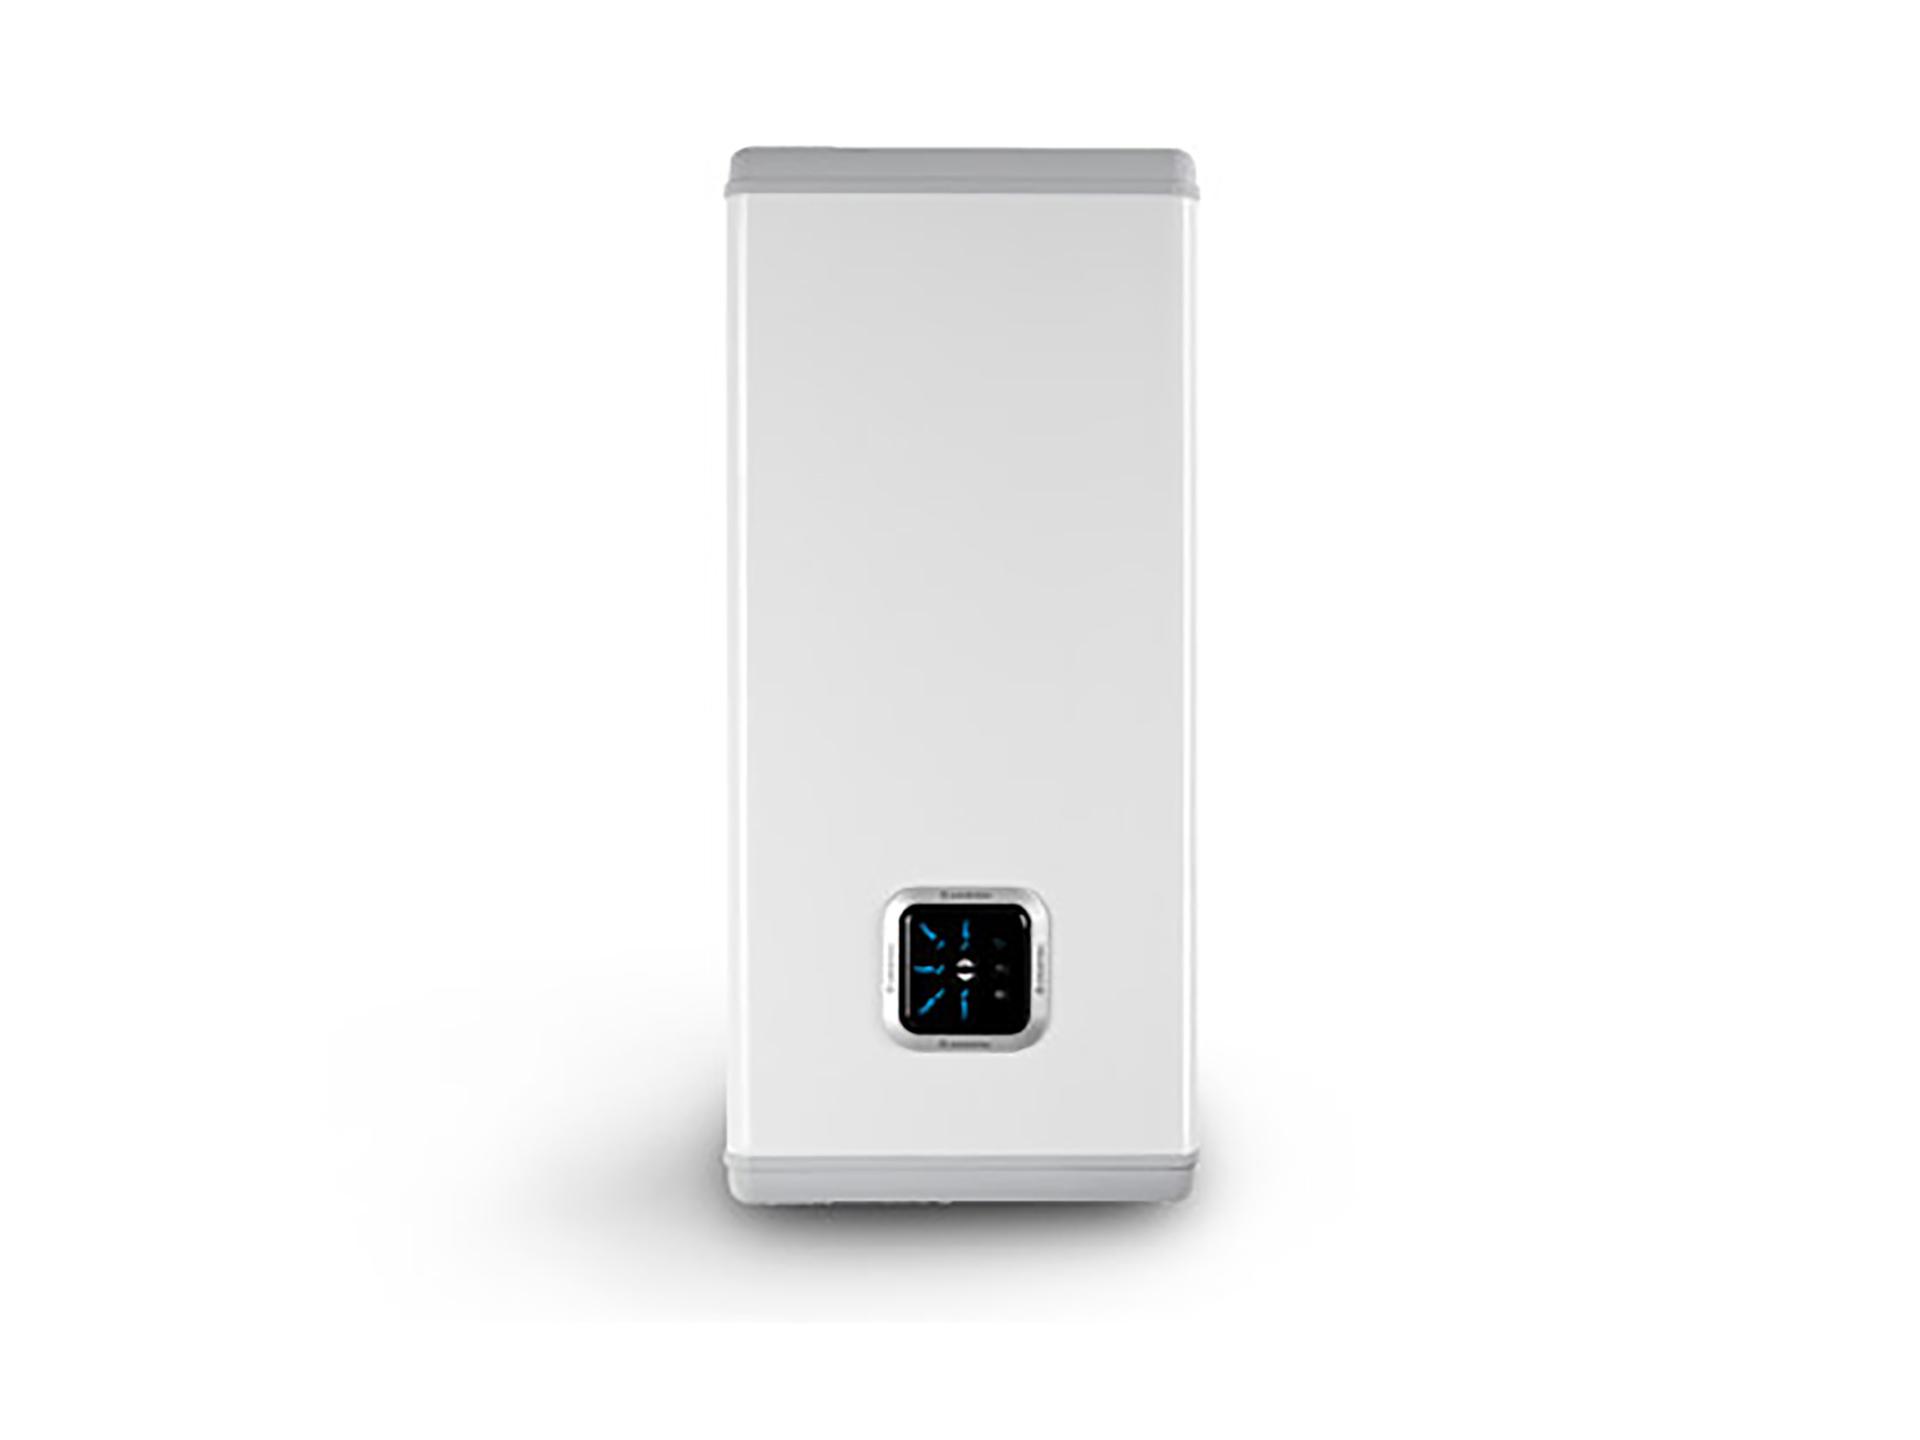 chauffe eau gaz butane brico depot elegant chauffe eau gaz brico depot chauffe eau pression eau. Black Bedroom Furniture Sets. Home Design Ideas